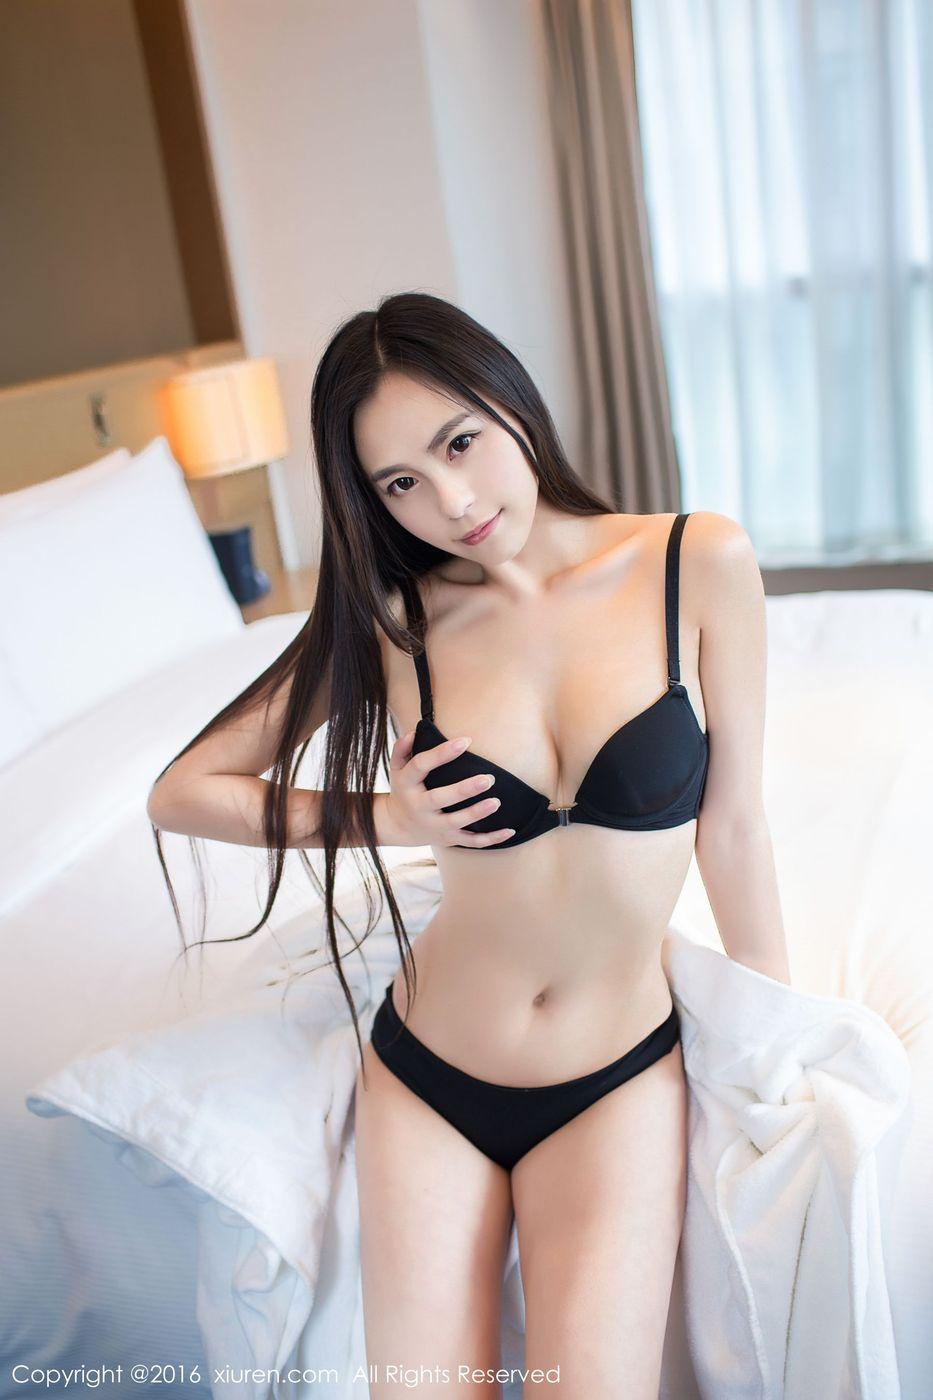 [XiuRen秀人网] 清纯美女Moa小姐白皙爆乳比基尼内衣诱惑养眼写真 No.535